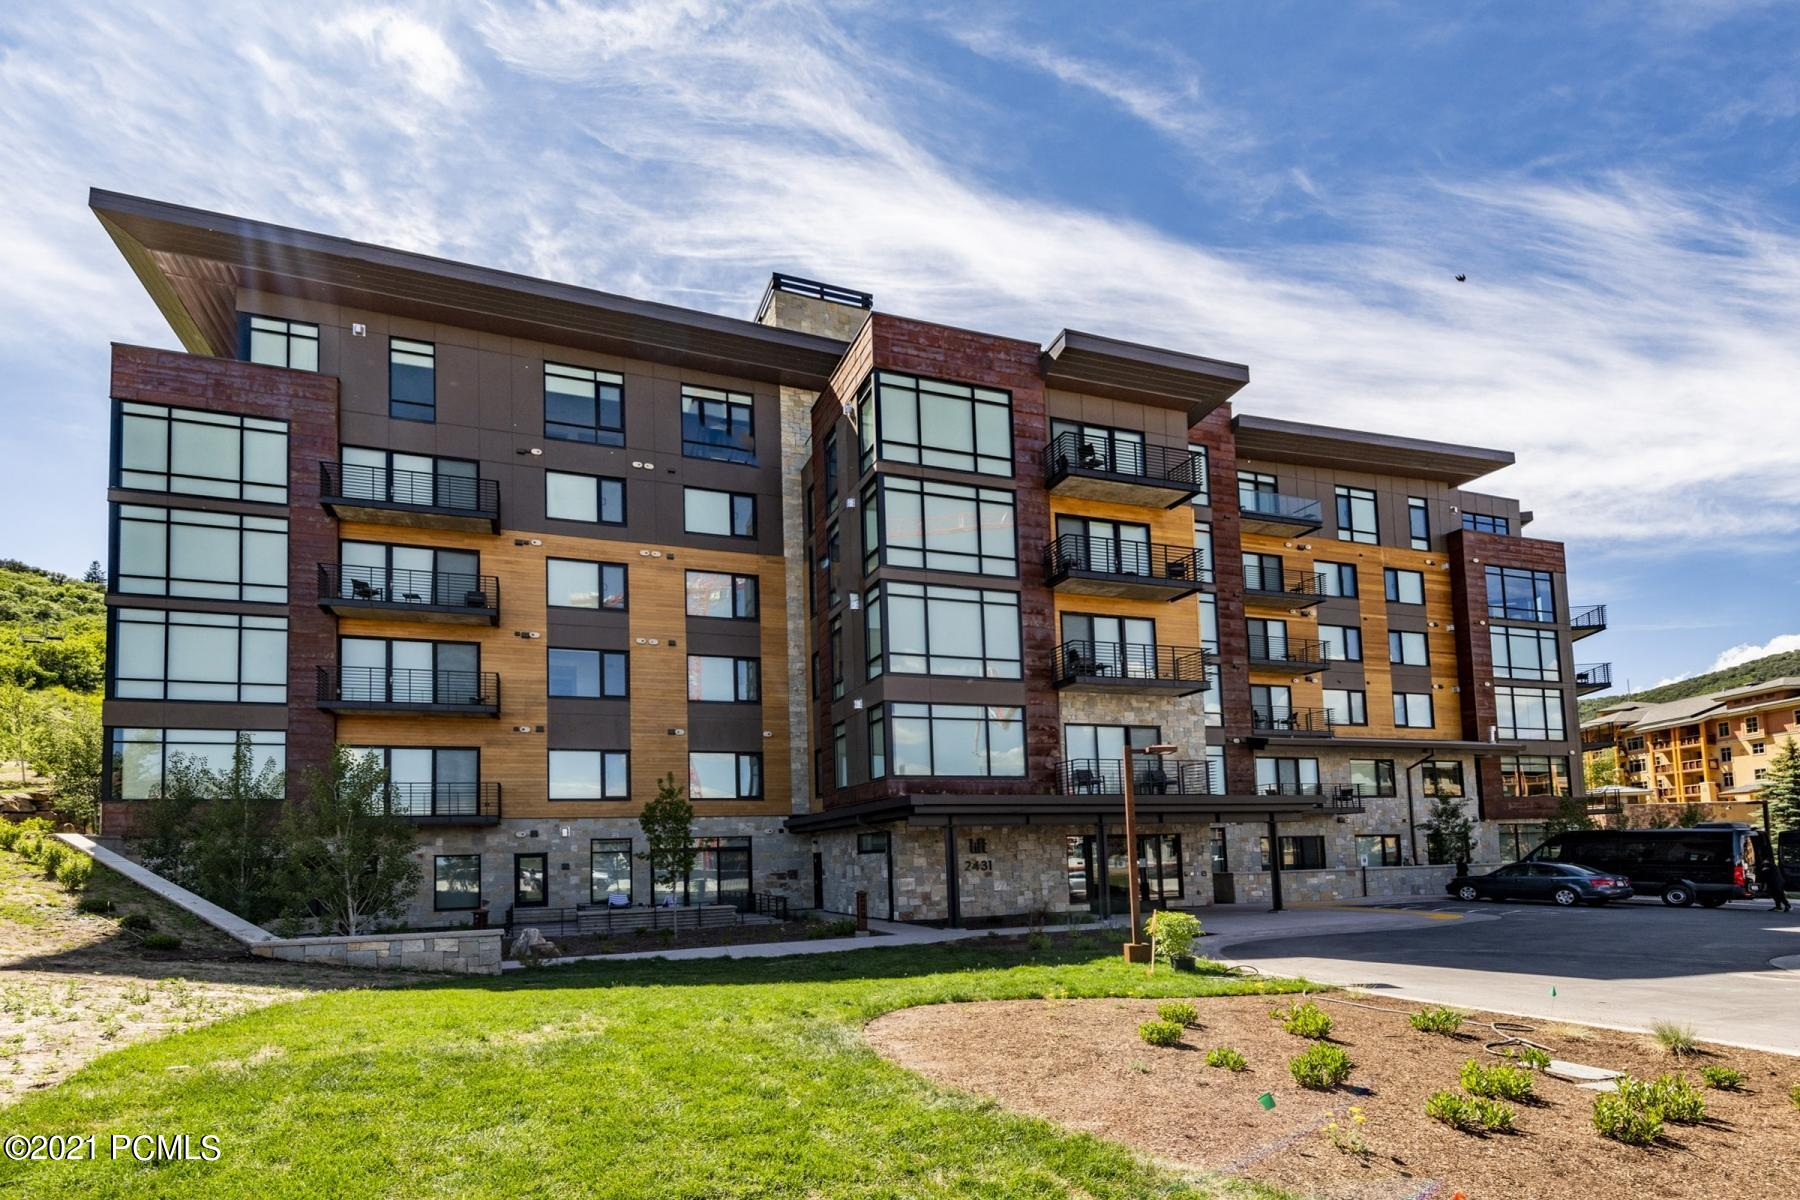 2431 High Mountain Road, Park City, Utah 84098, 3 Bedrooms Bedrooms, ,3 BathroomsBathrooms,Condominium,For Sale,High Mountain,12101369